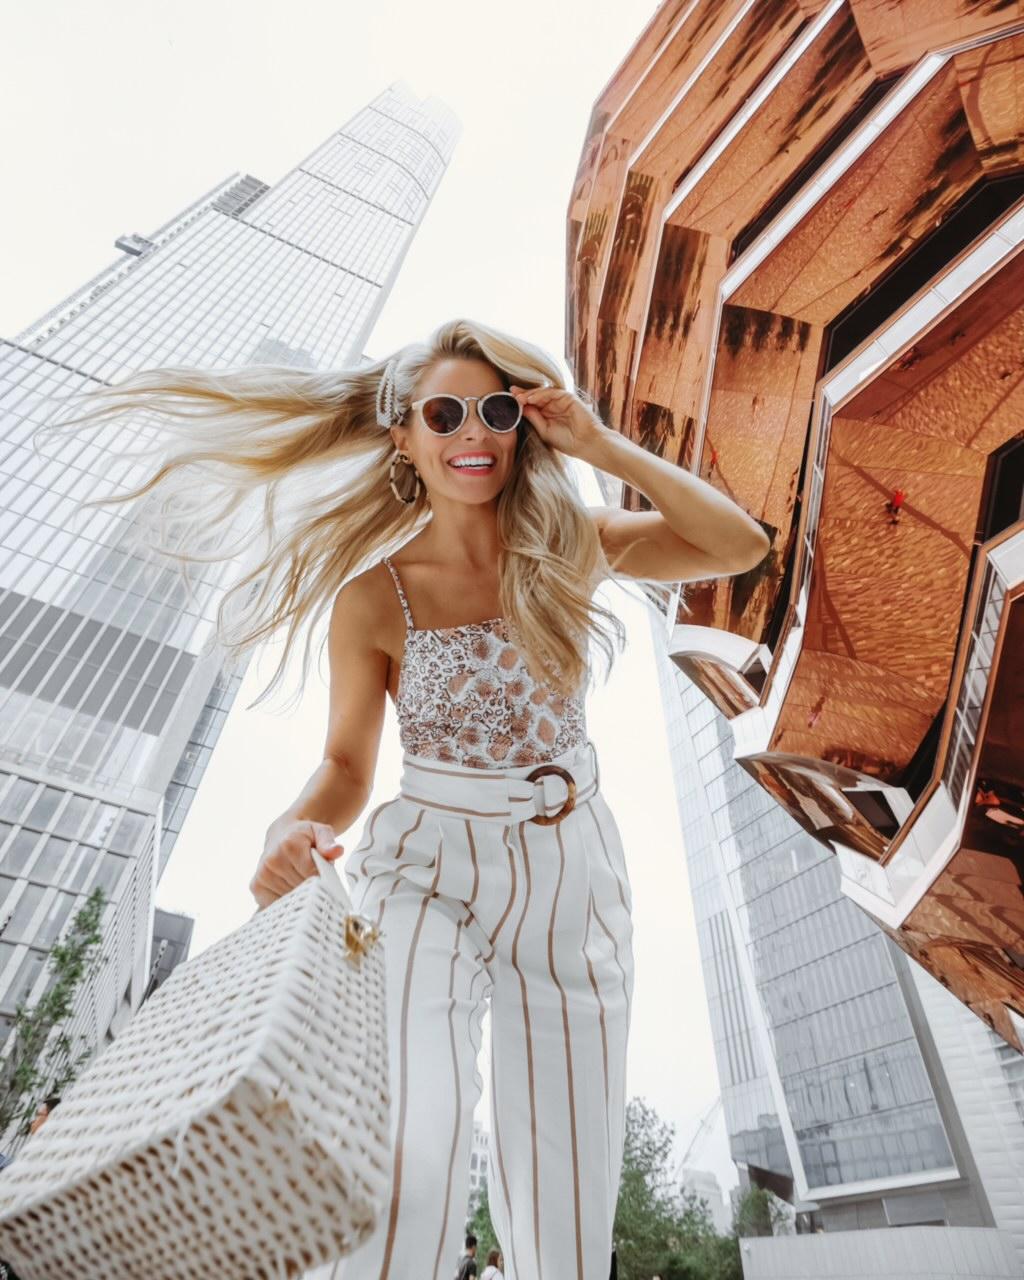 Nordstrom Sale, NSALE, Olivia Rink, Topshop, Petite Outfit